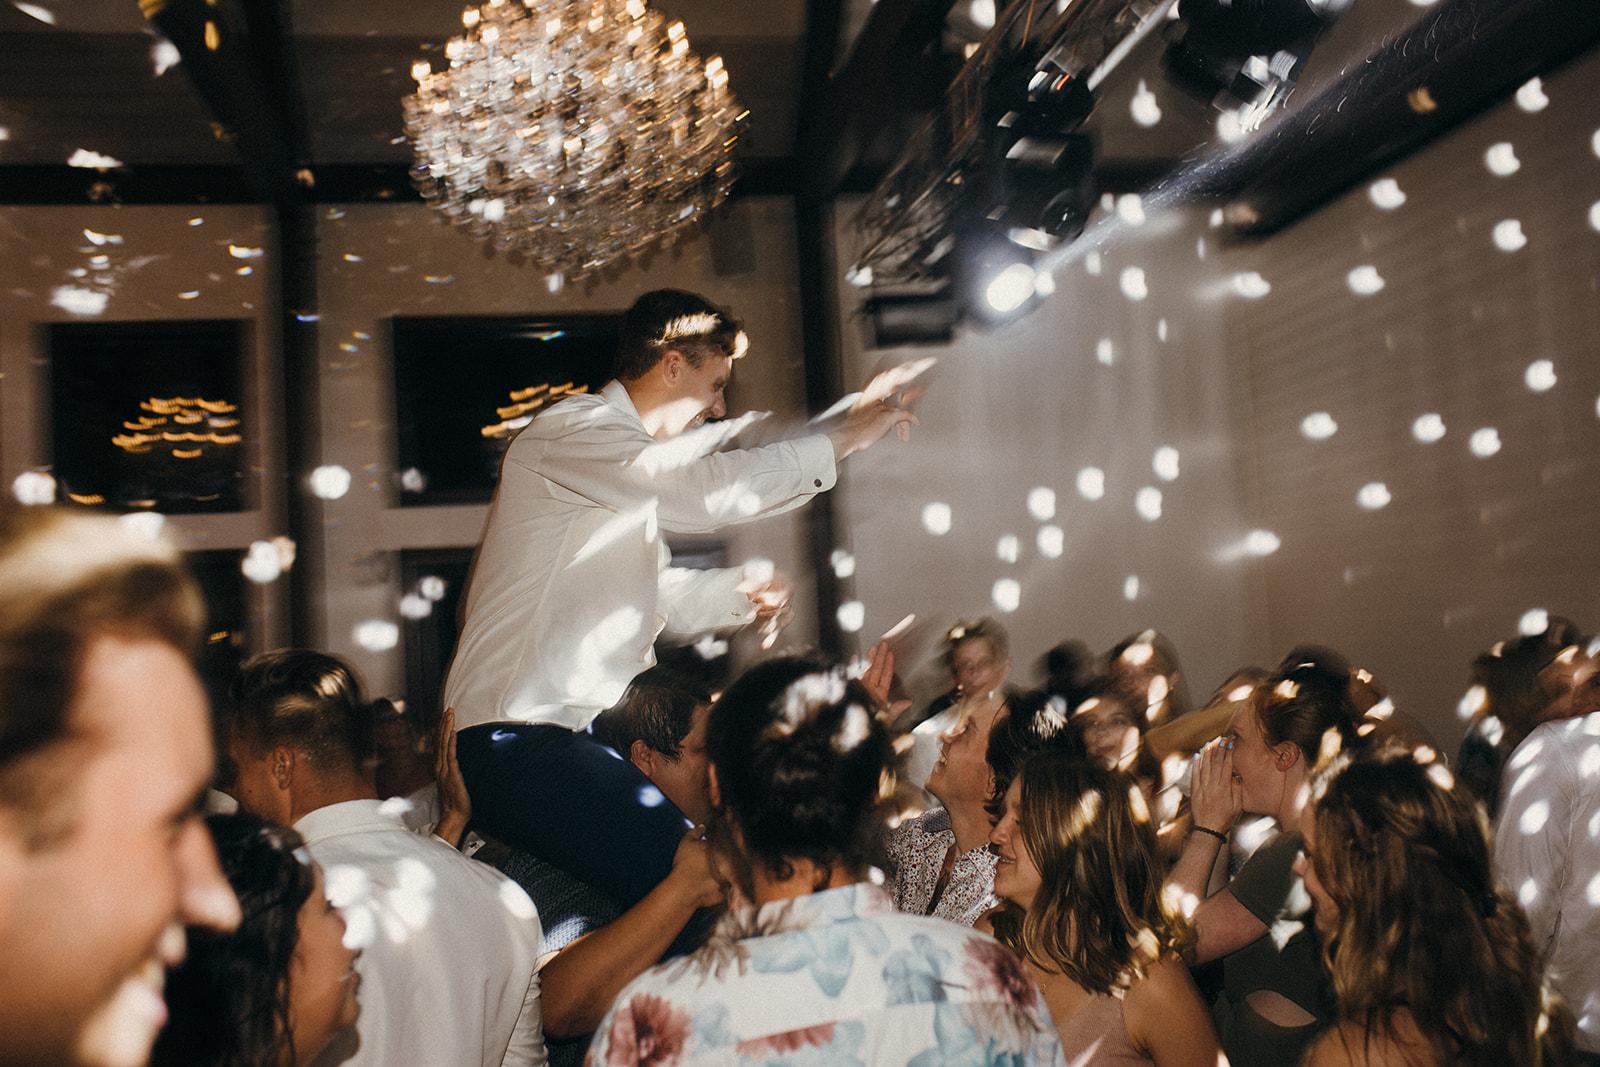 kaden_justine_wedding_4097.jpg